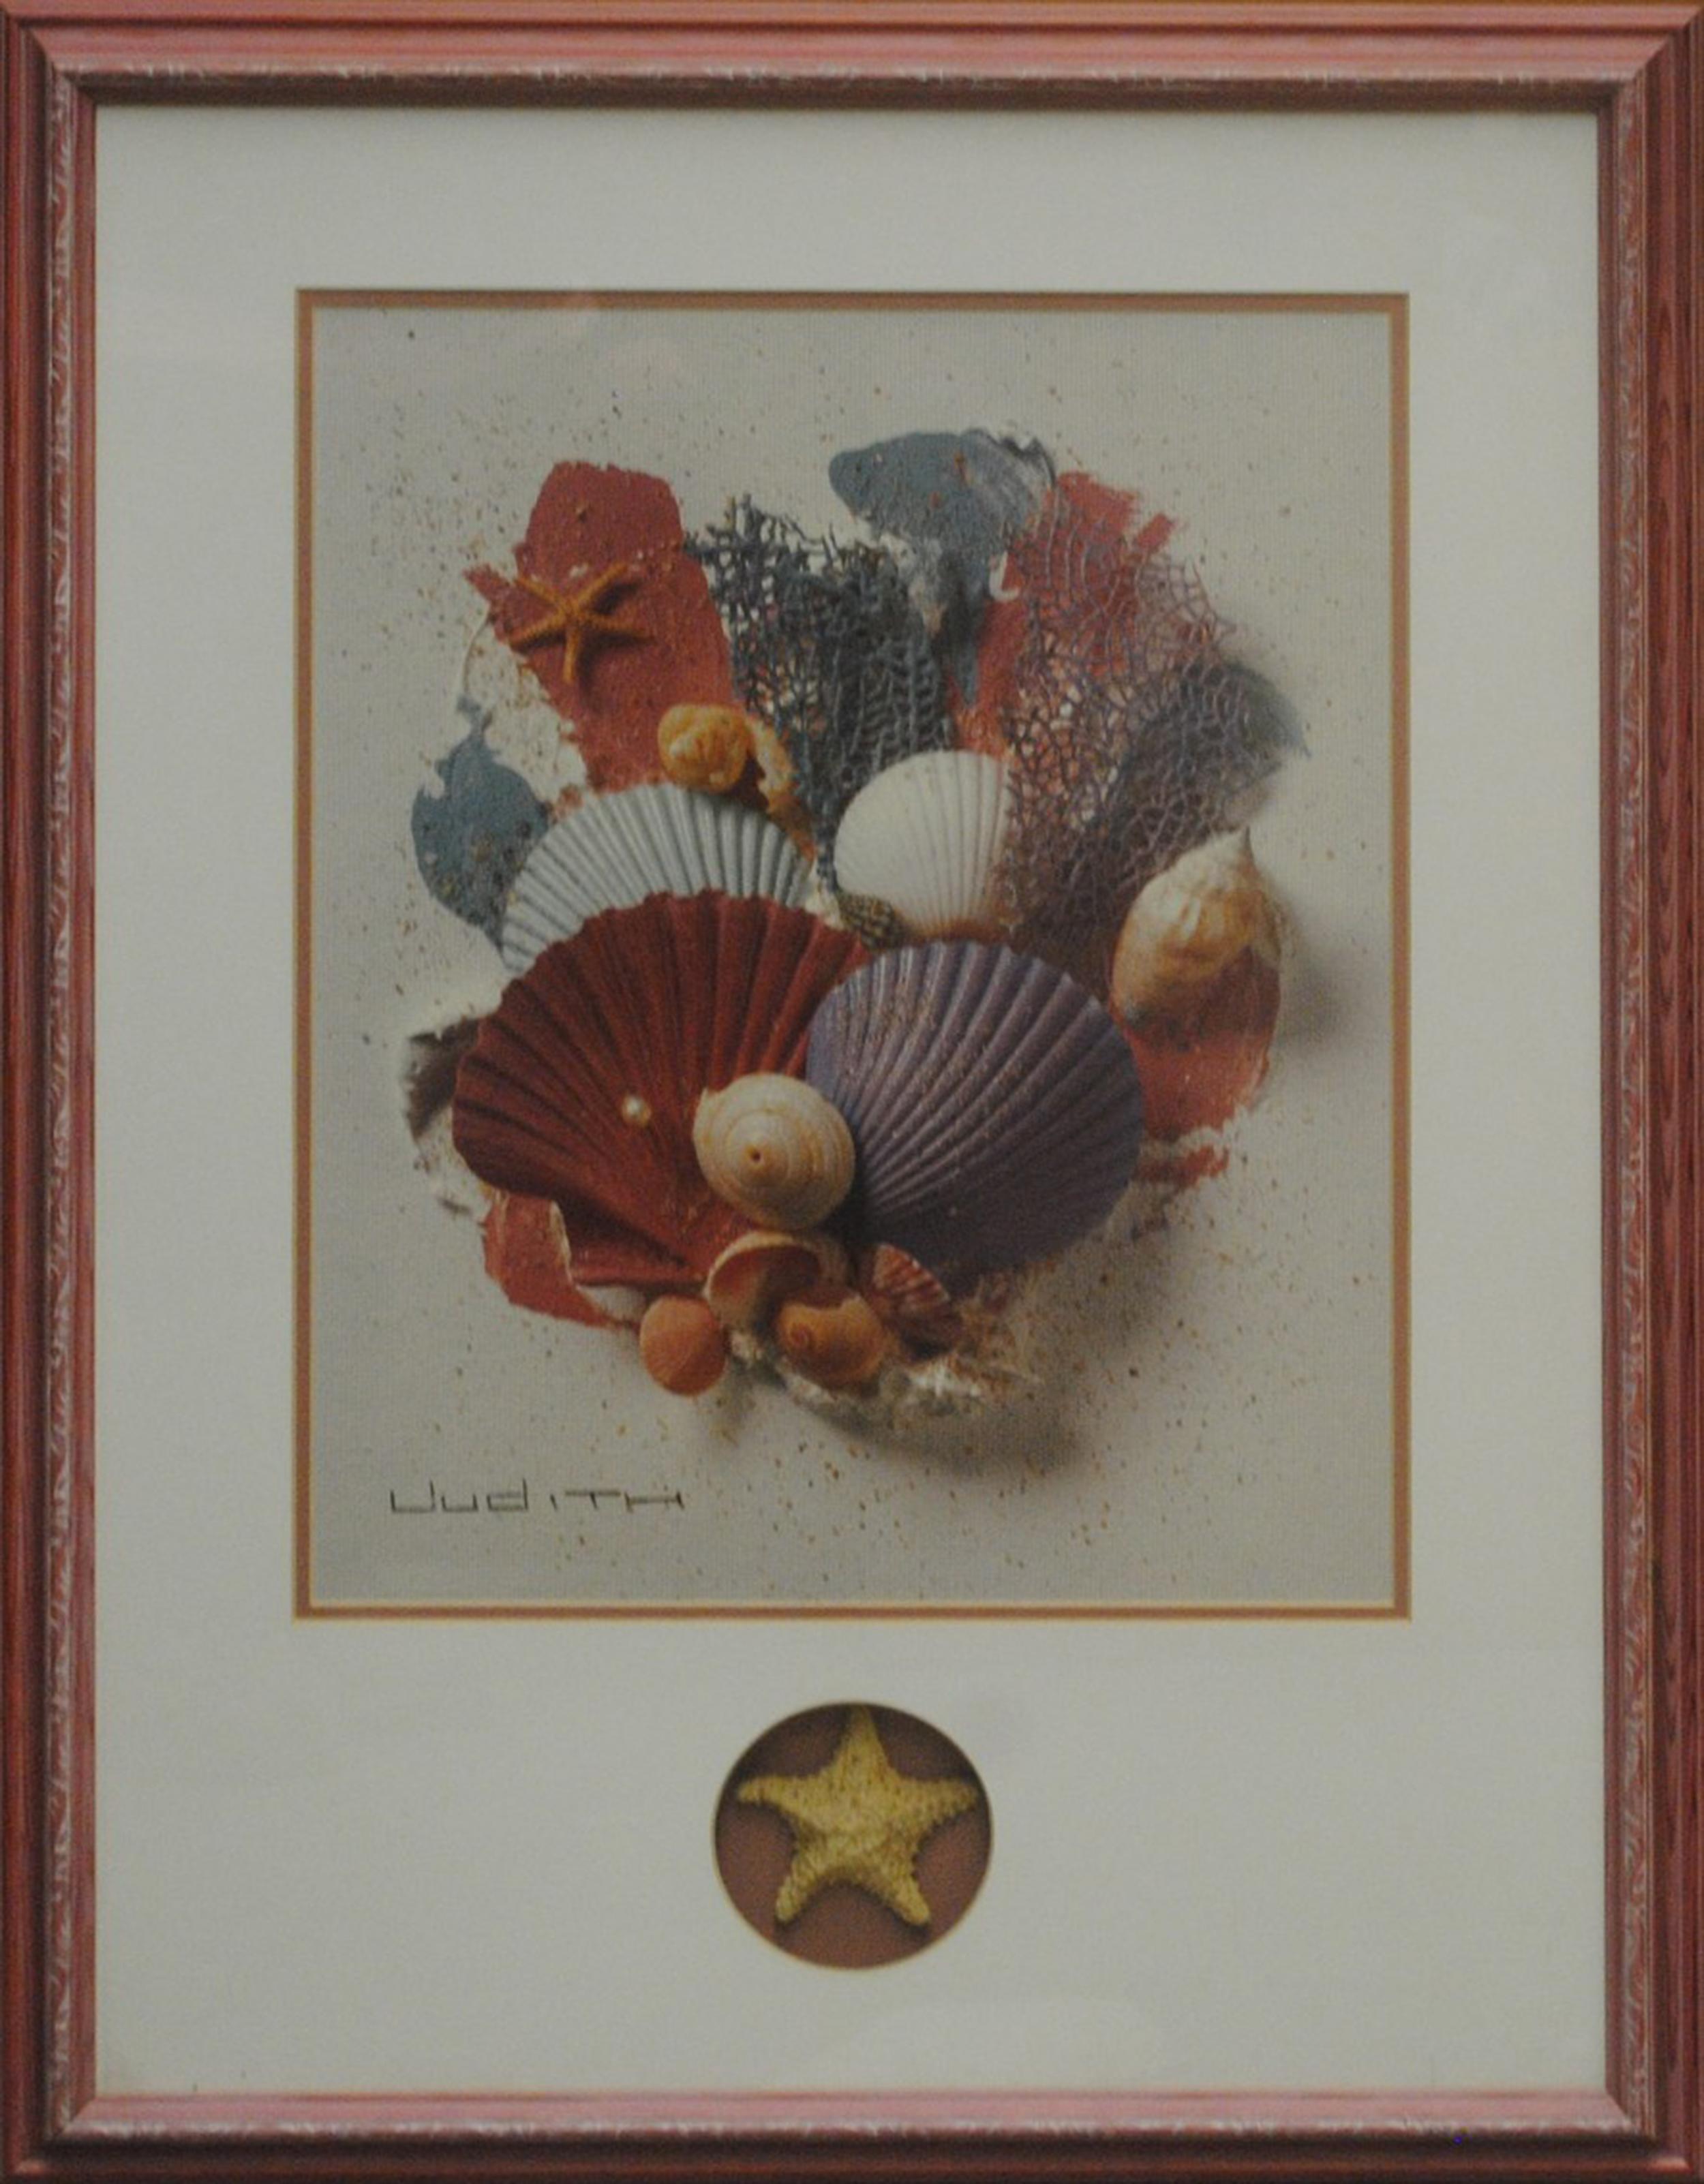 Open Seashell Print With Seashell